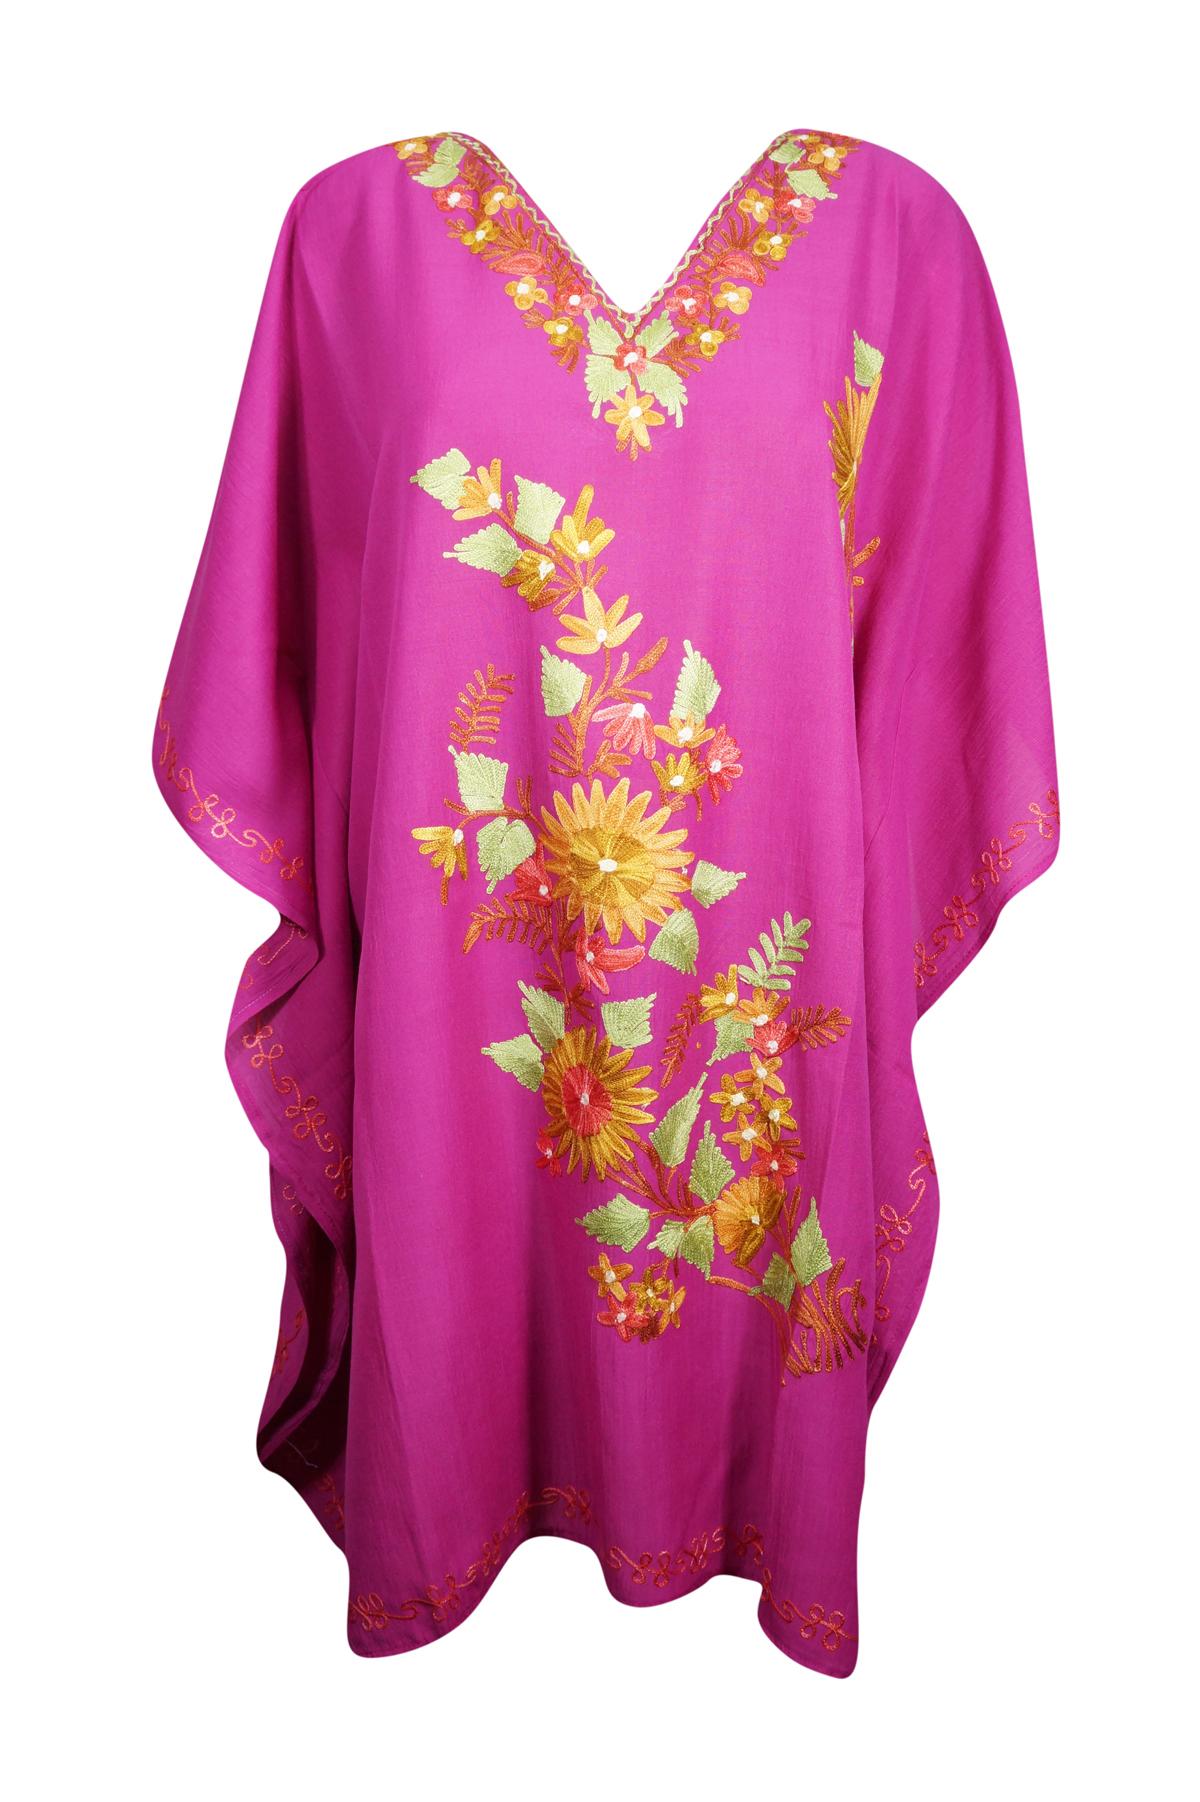 7a4f0b77495e7 Summer Cotton Tunic Caftan Floral Embroidered Beach Bikini Cover Up ...